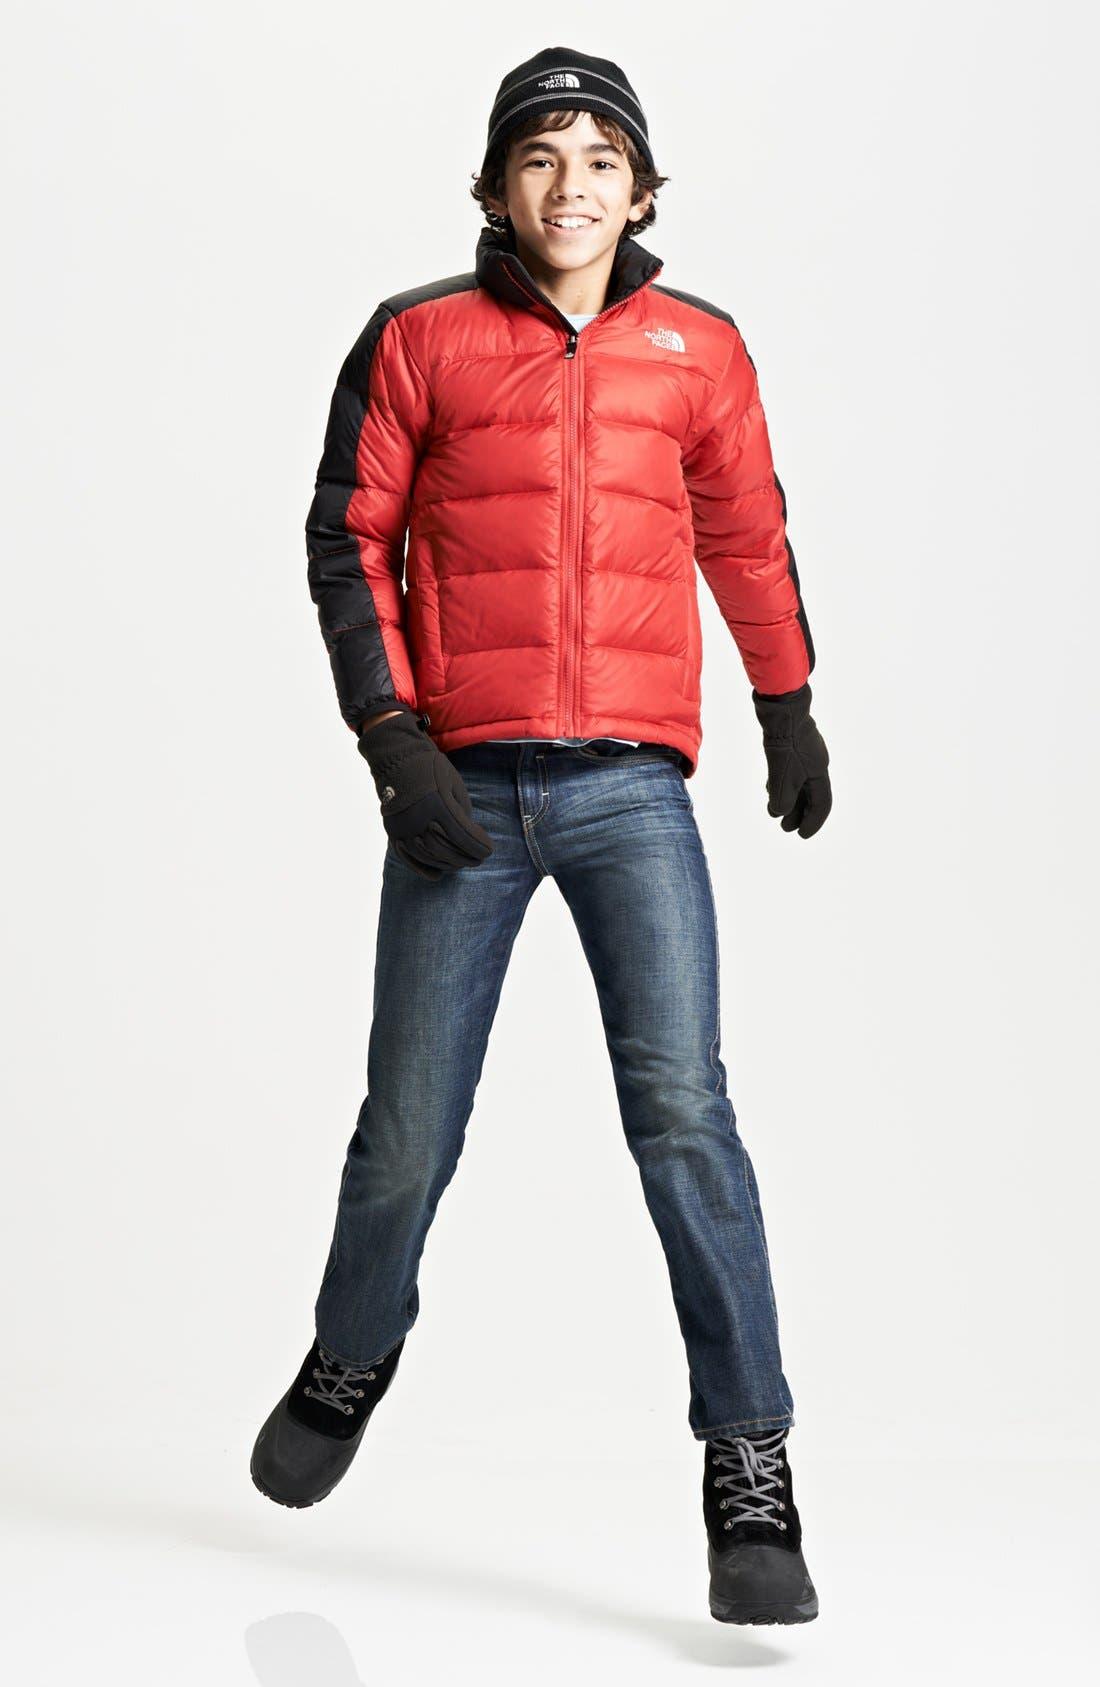 Main Image - The North Face Jacket & Tucker + Tate Jeans (Big Boys)